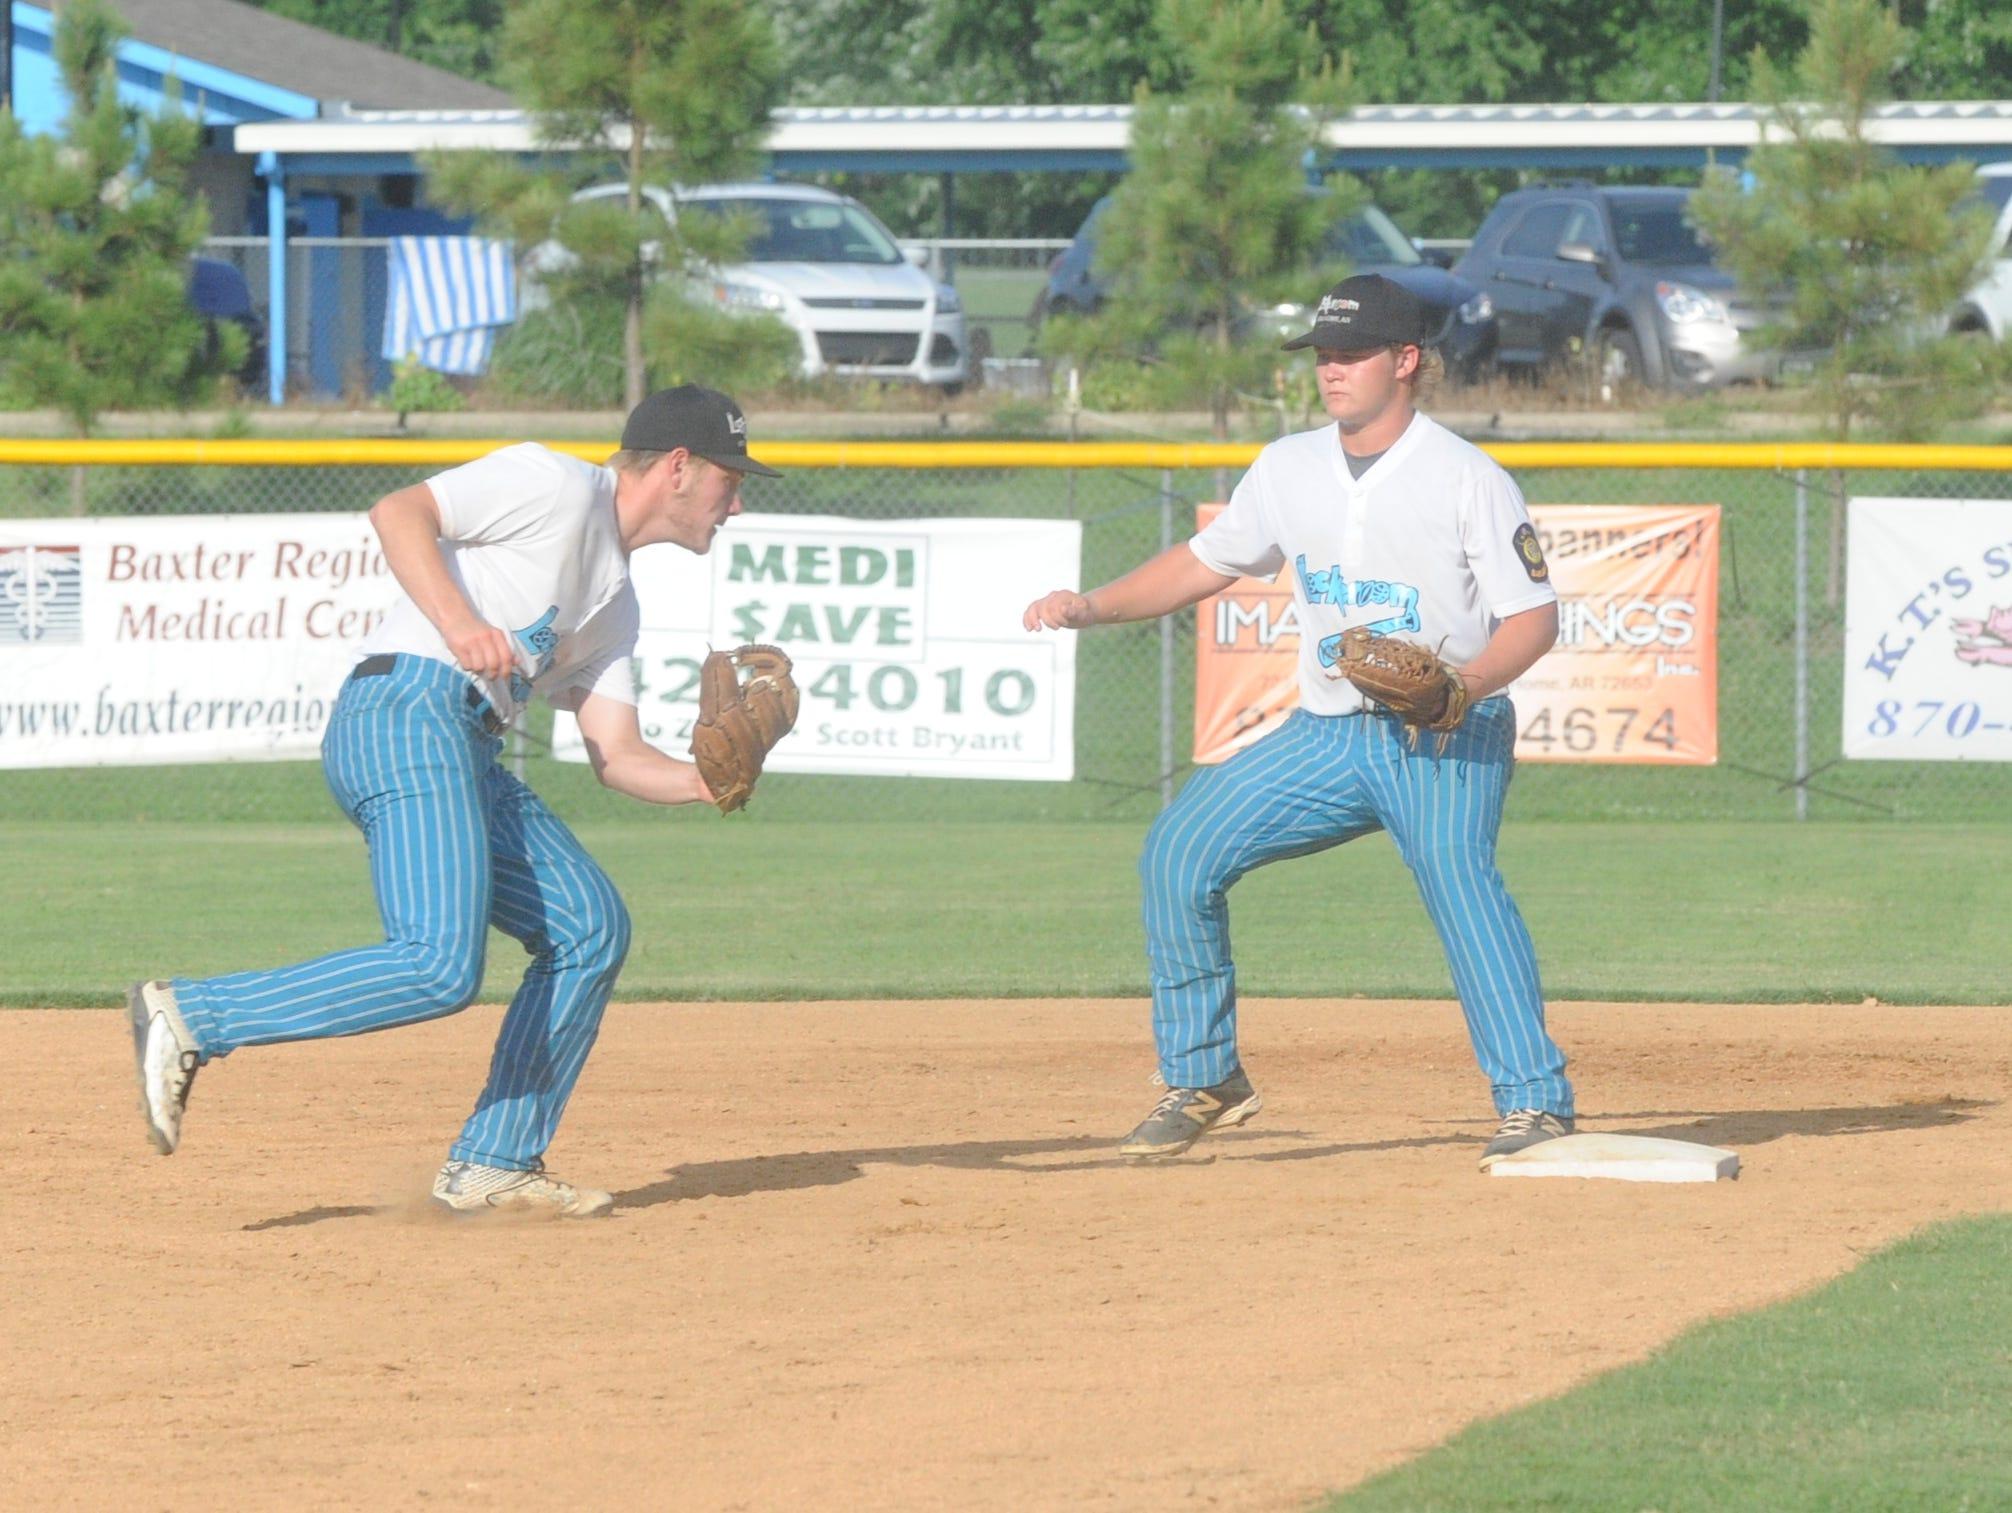 Lockeroom shortstop Hayden Hall and second baseman Matt Robbins converge on a ground ball during Mountain Home's 8-0 loss to Jonesboro on Saturday. Lockeroom also fell to Jonesboro, 6-4, on Friday night at Jonesboro.